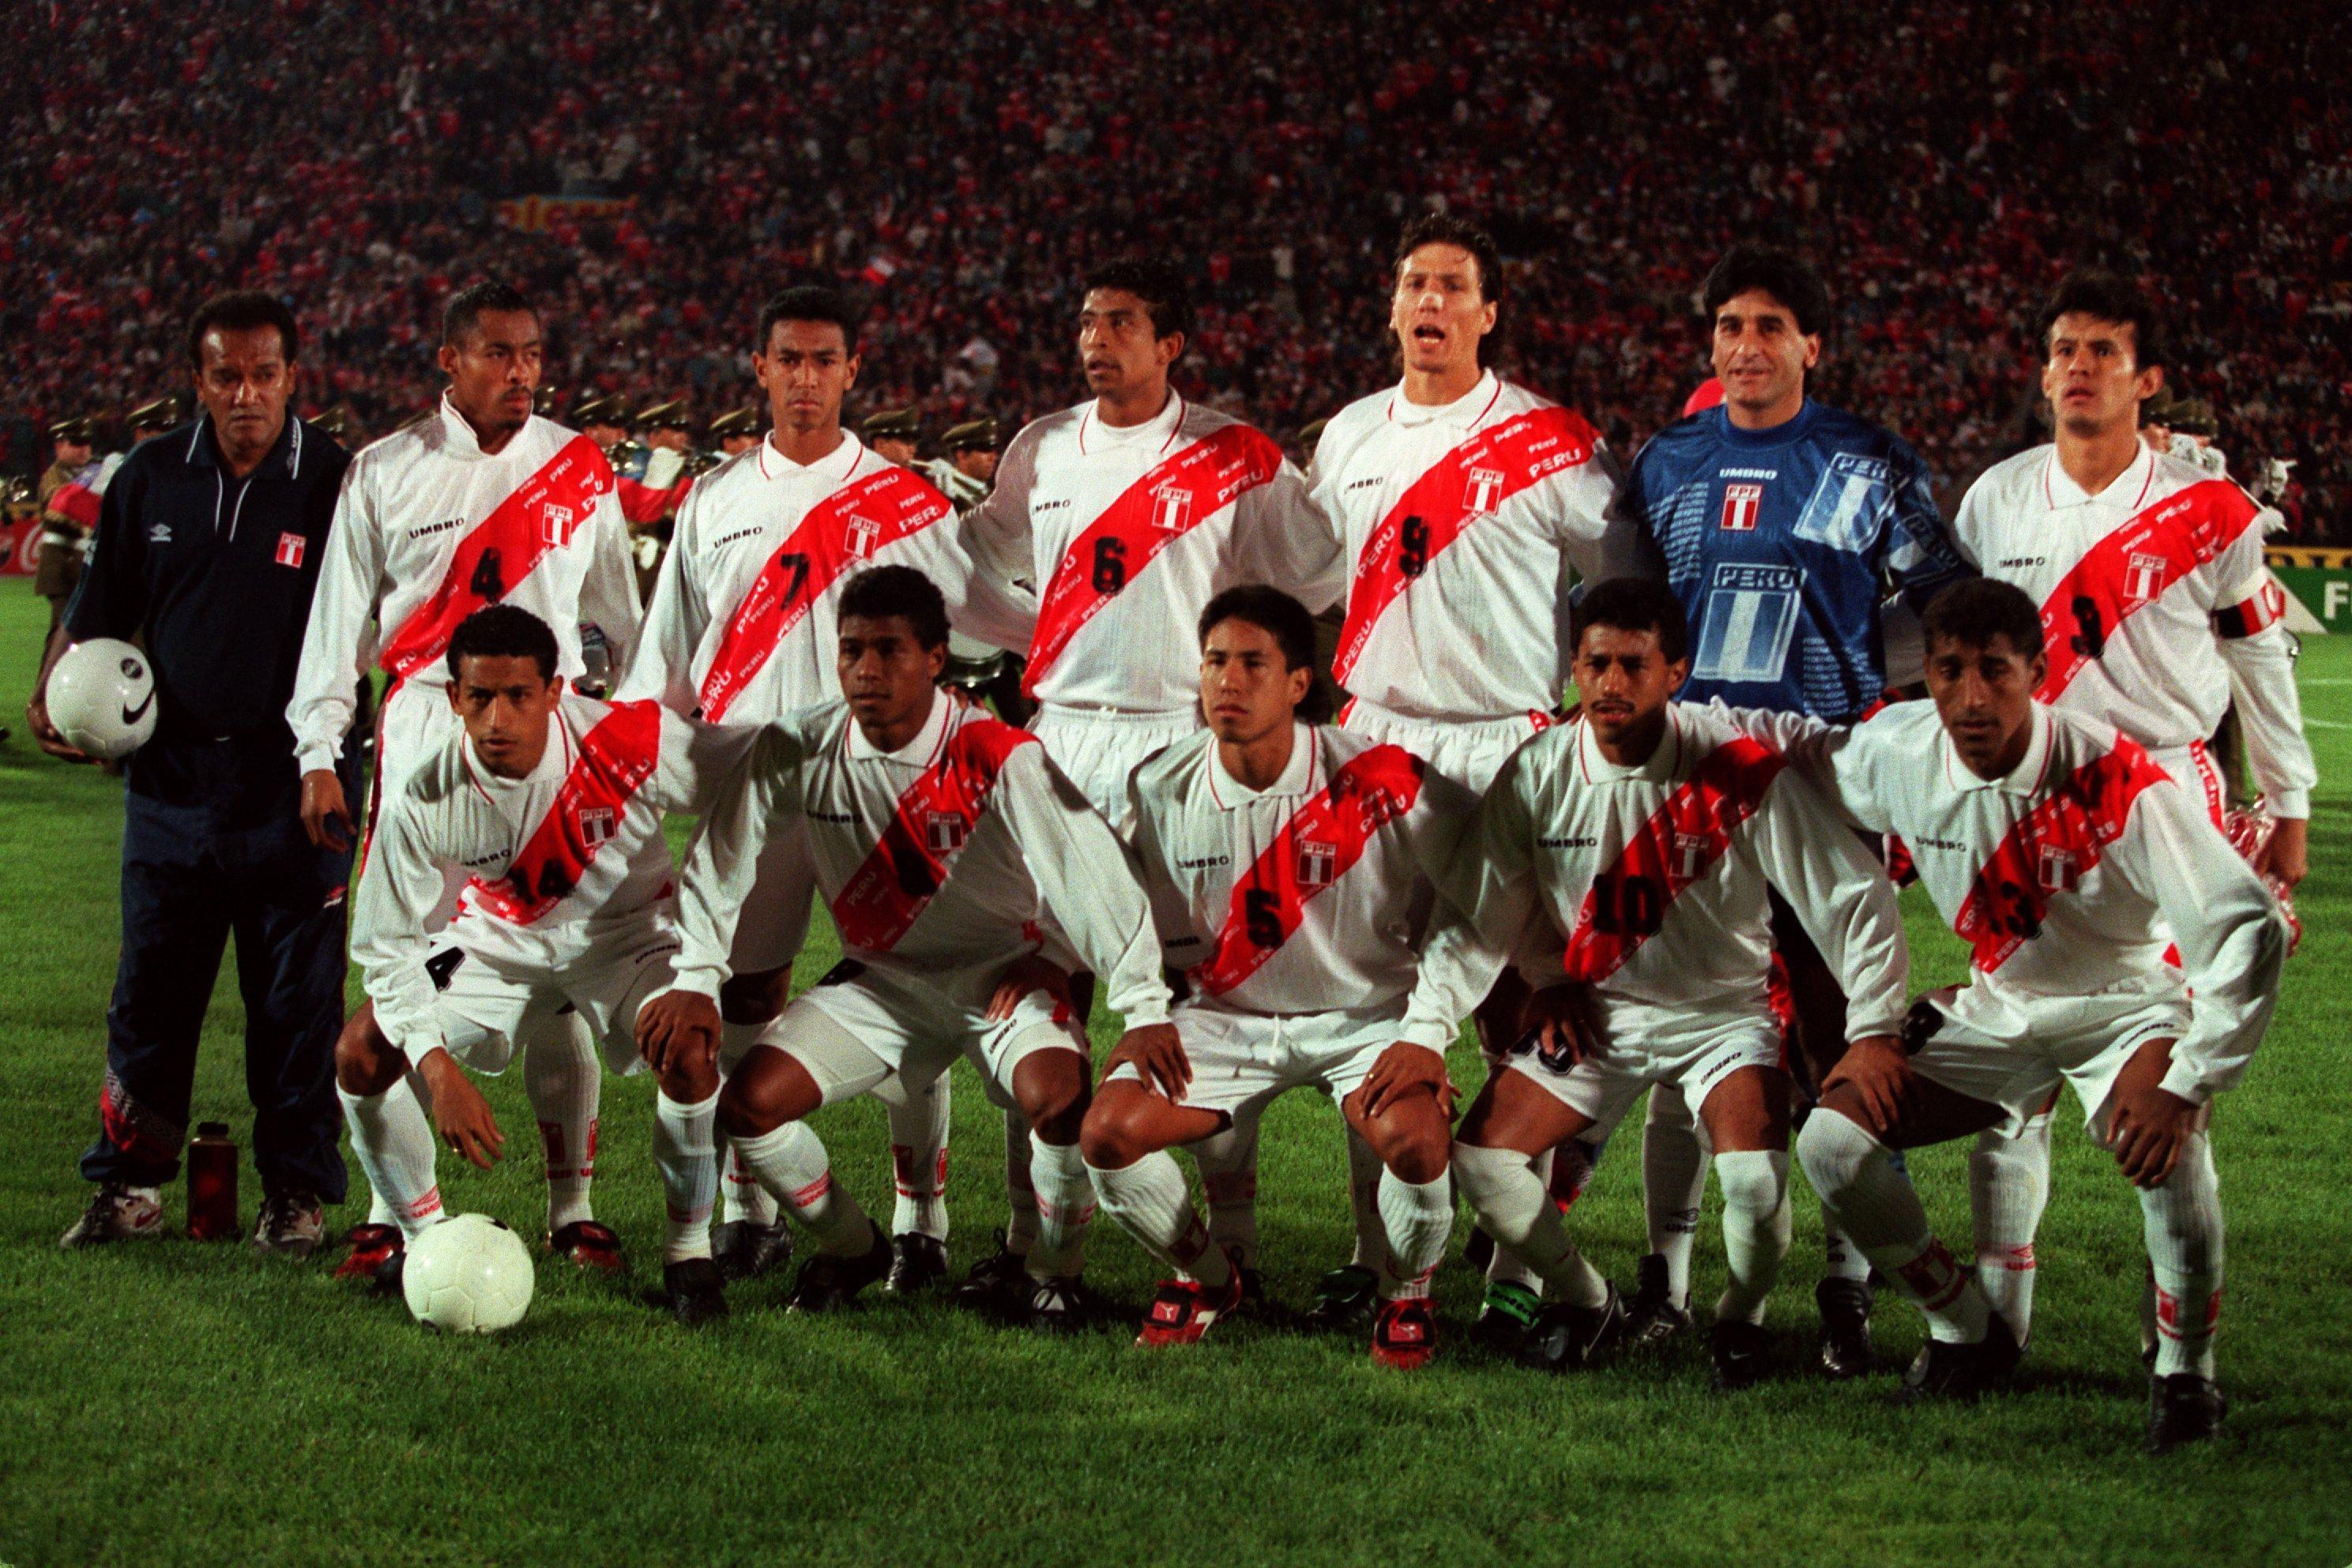 Soccer - World Cup Qualifier - Chile v Peru